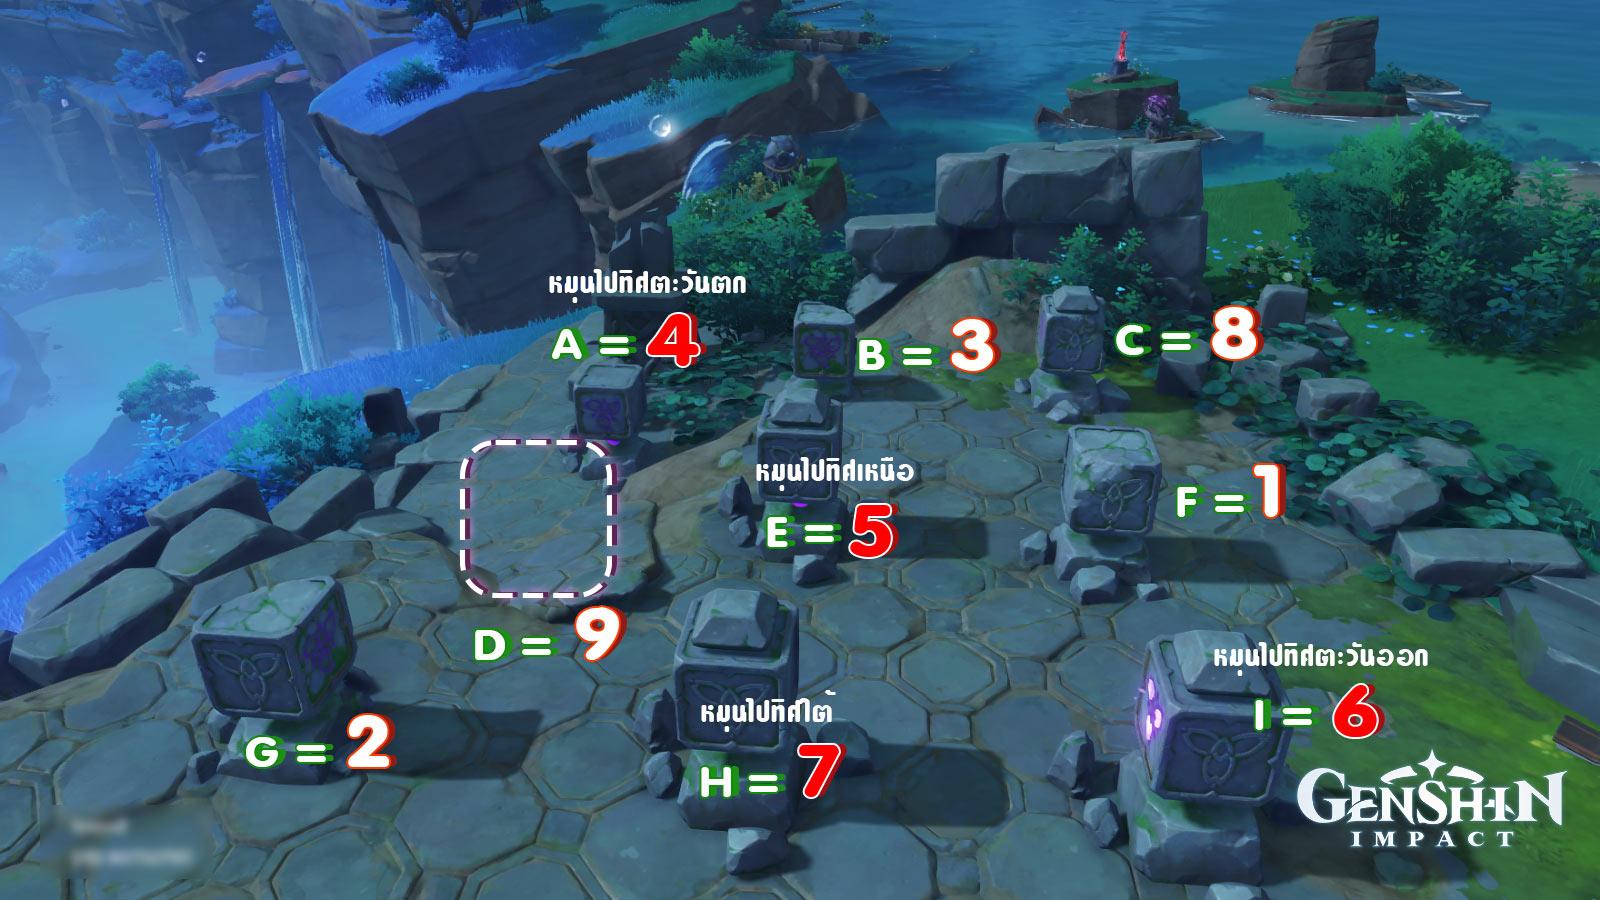 Genshin Impact ปริศนาแท่นหิน 9 ช่อง เฉลย